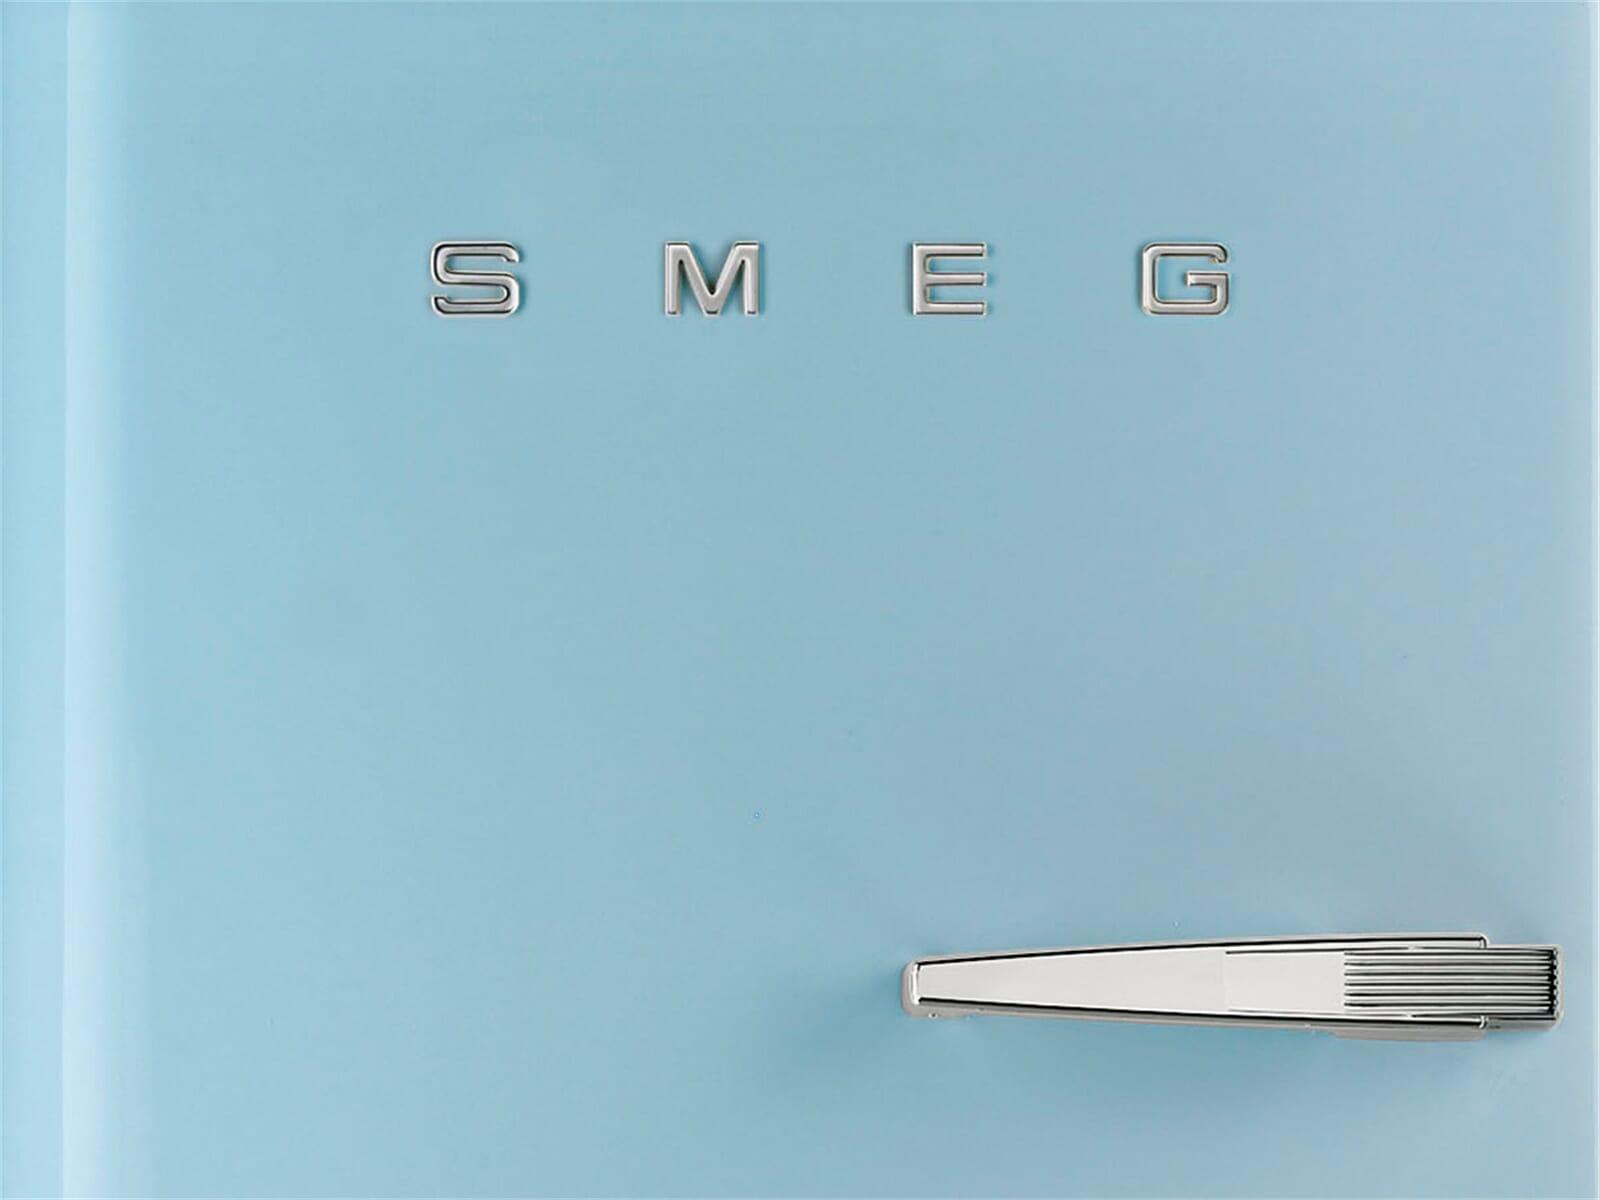 Smeg Kühlschrank Pastellblau : Kühl gefrierkombi retro smeg fab laz stand gefrierkombi